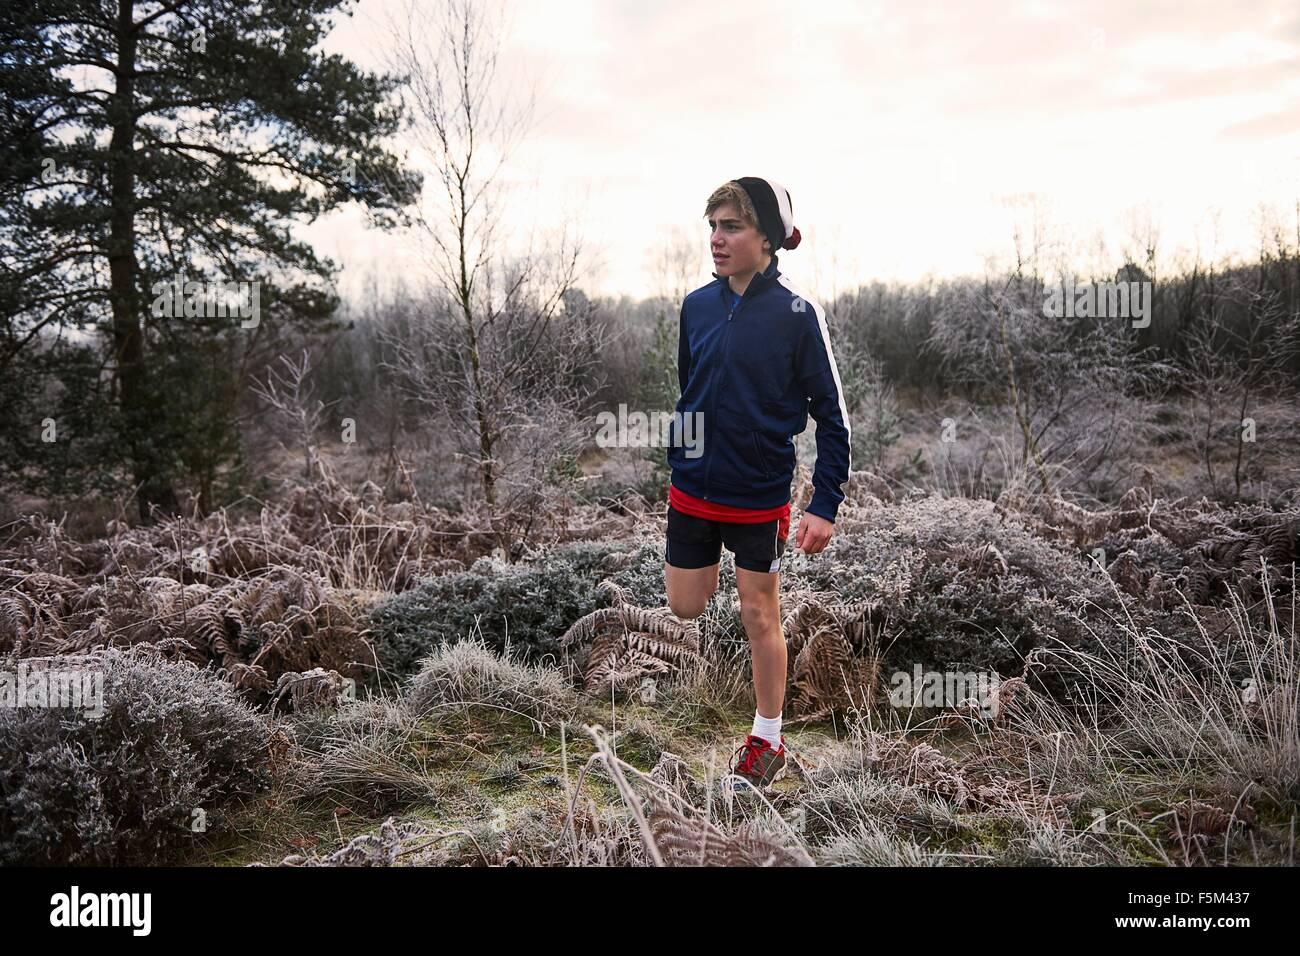 Teenage boy on frosty grassland wearing sportswear stretching leg looking away - Stock Image